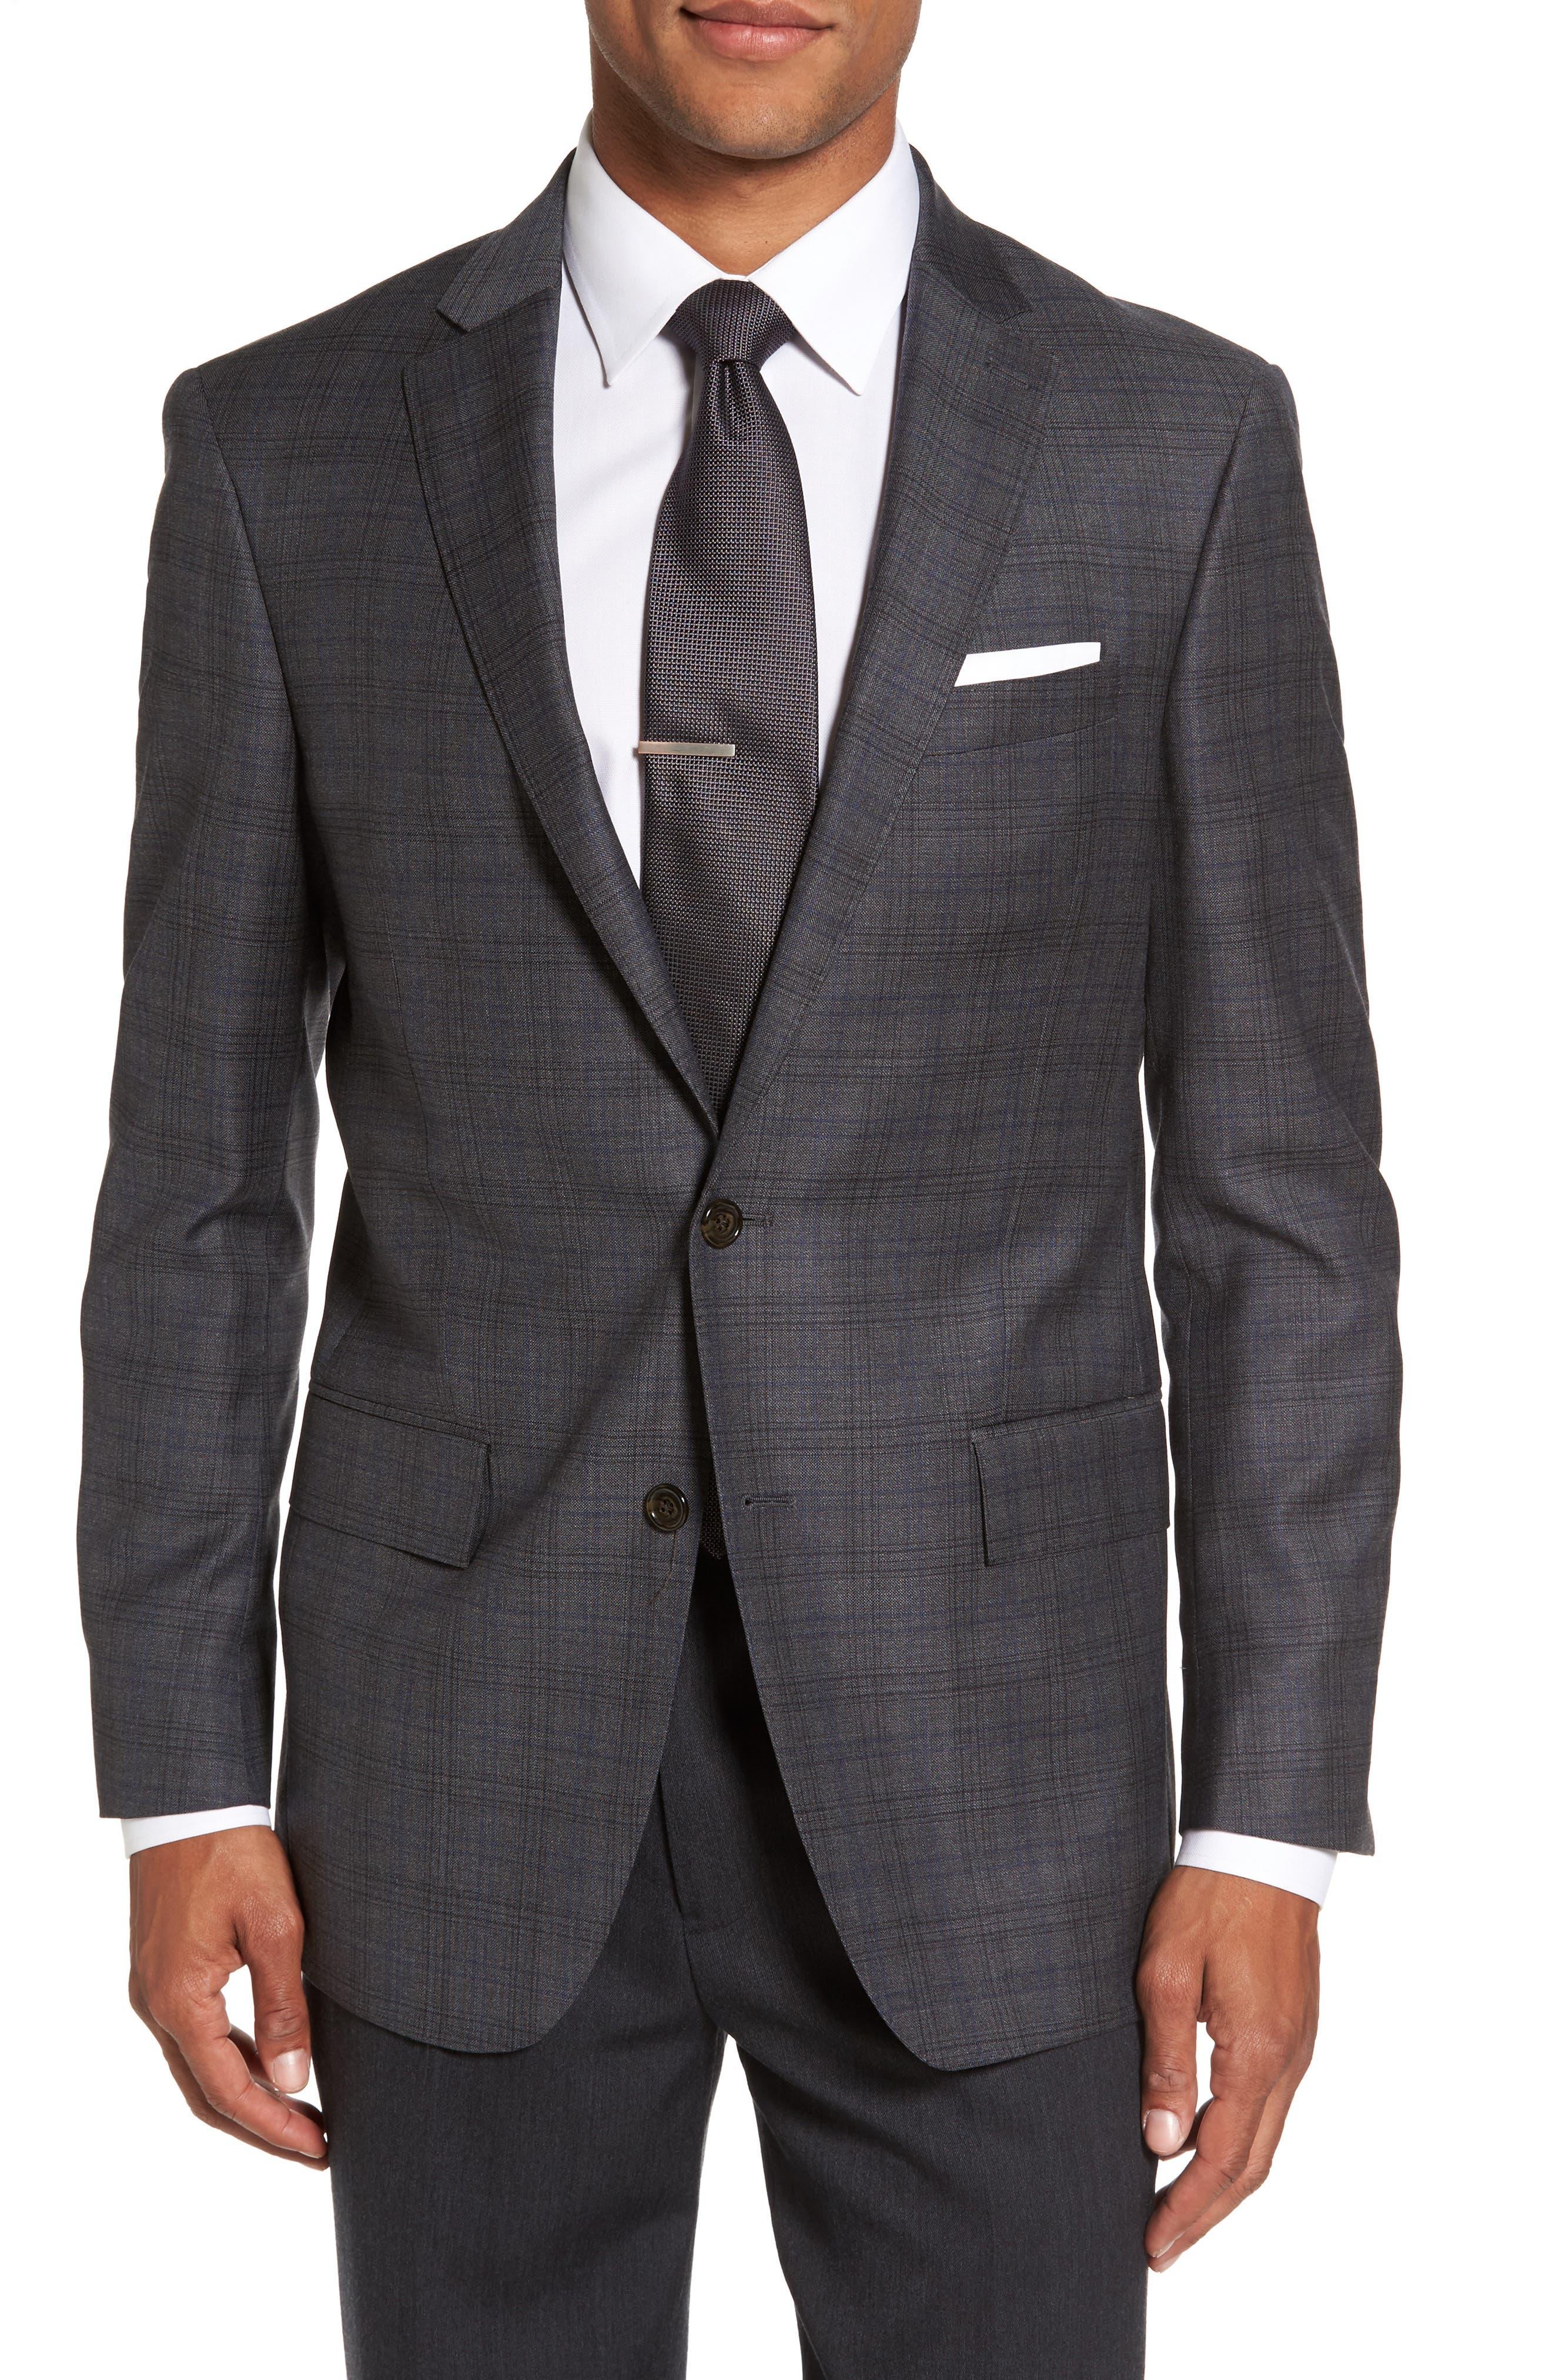 Todd Snyder White Label Sutton Trim Fit Plaid Wool Sport Coat